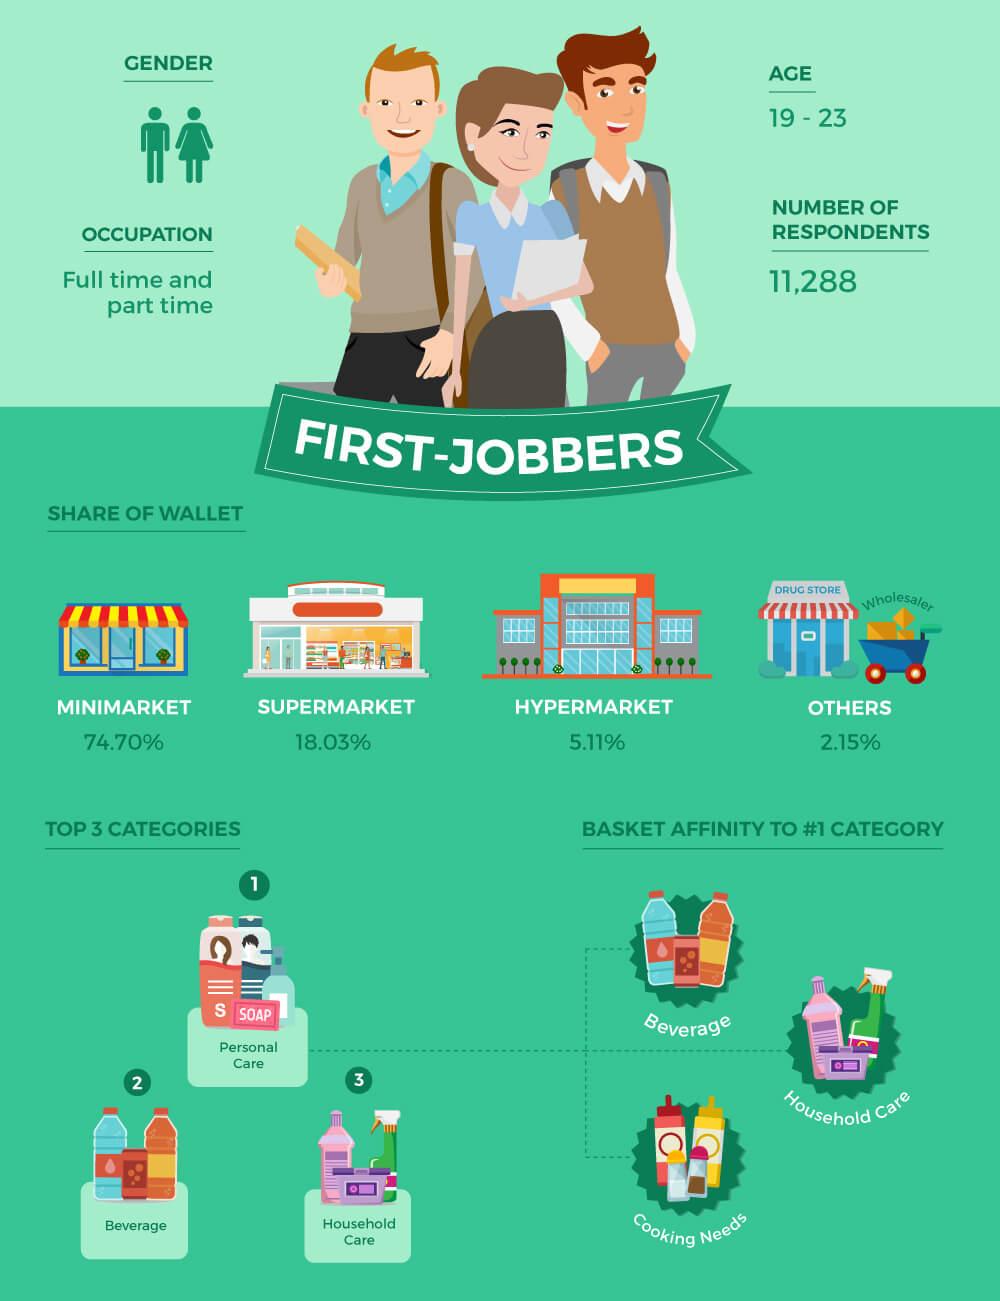 First-Jobbers Shopper Persona